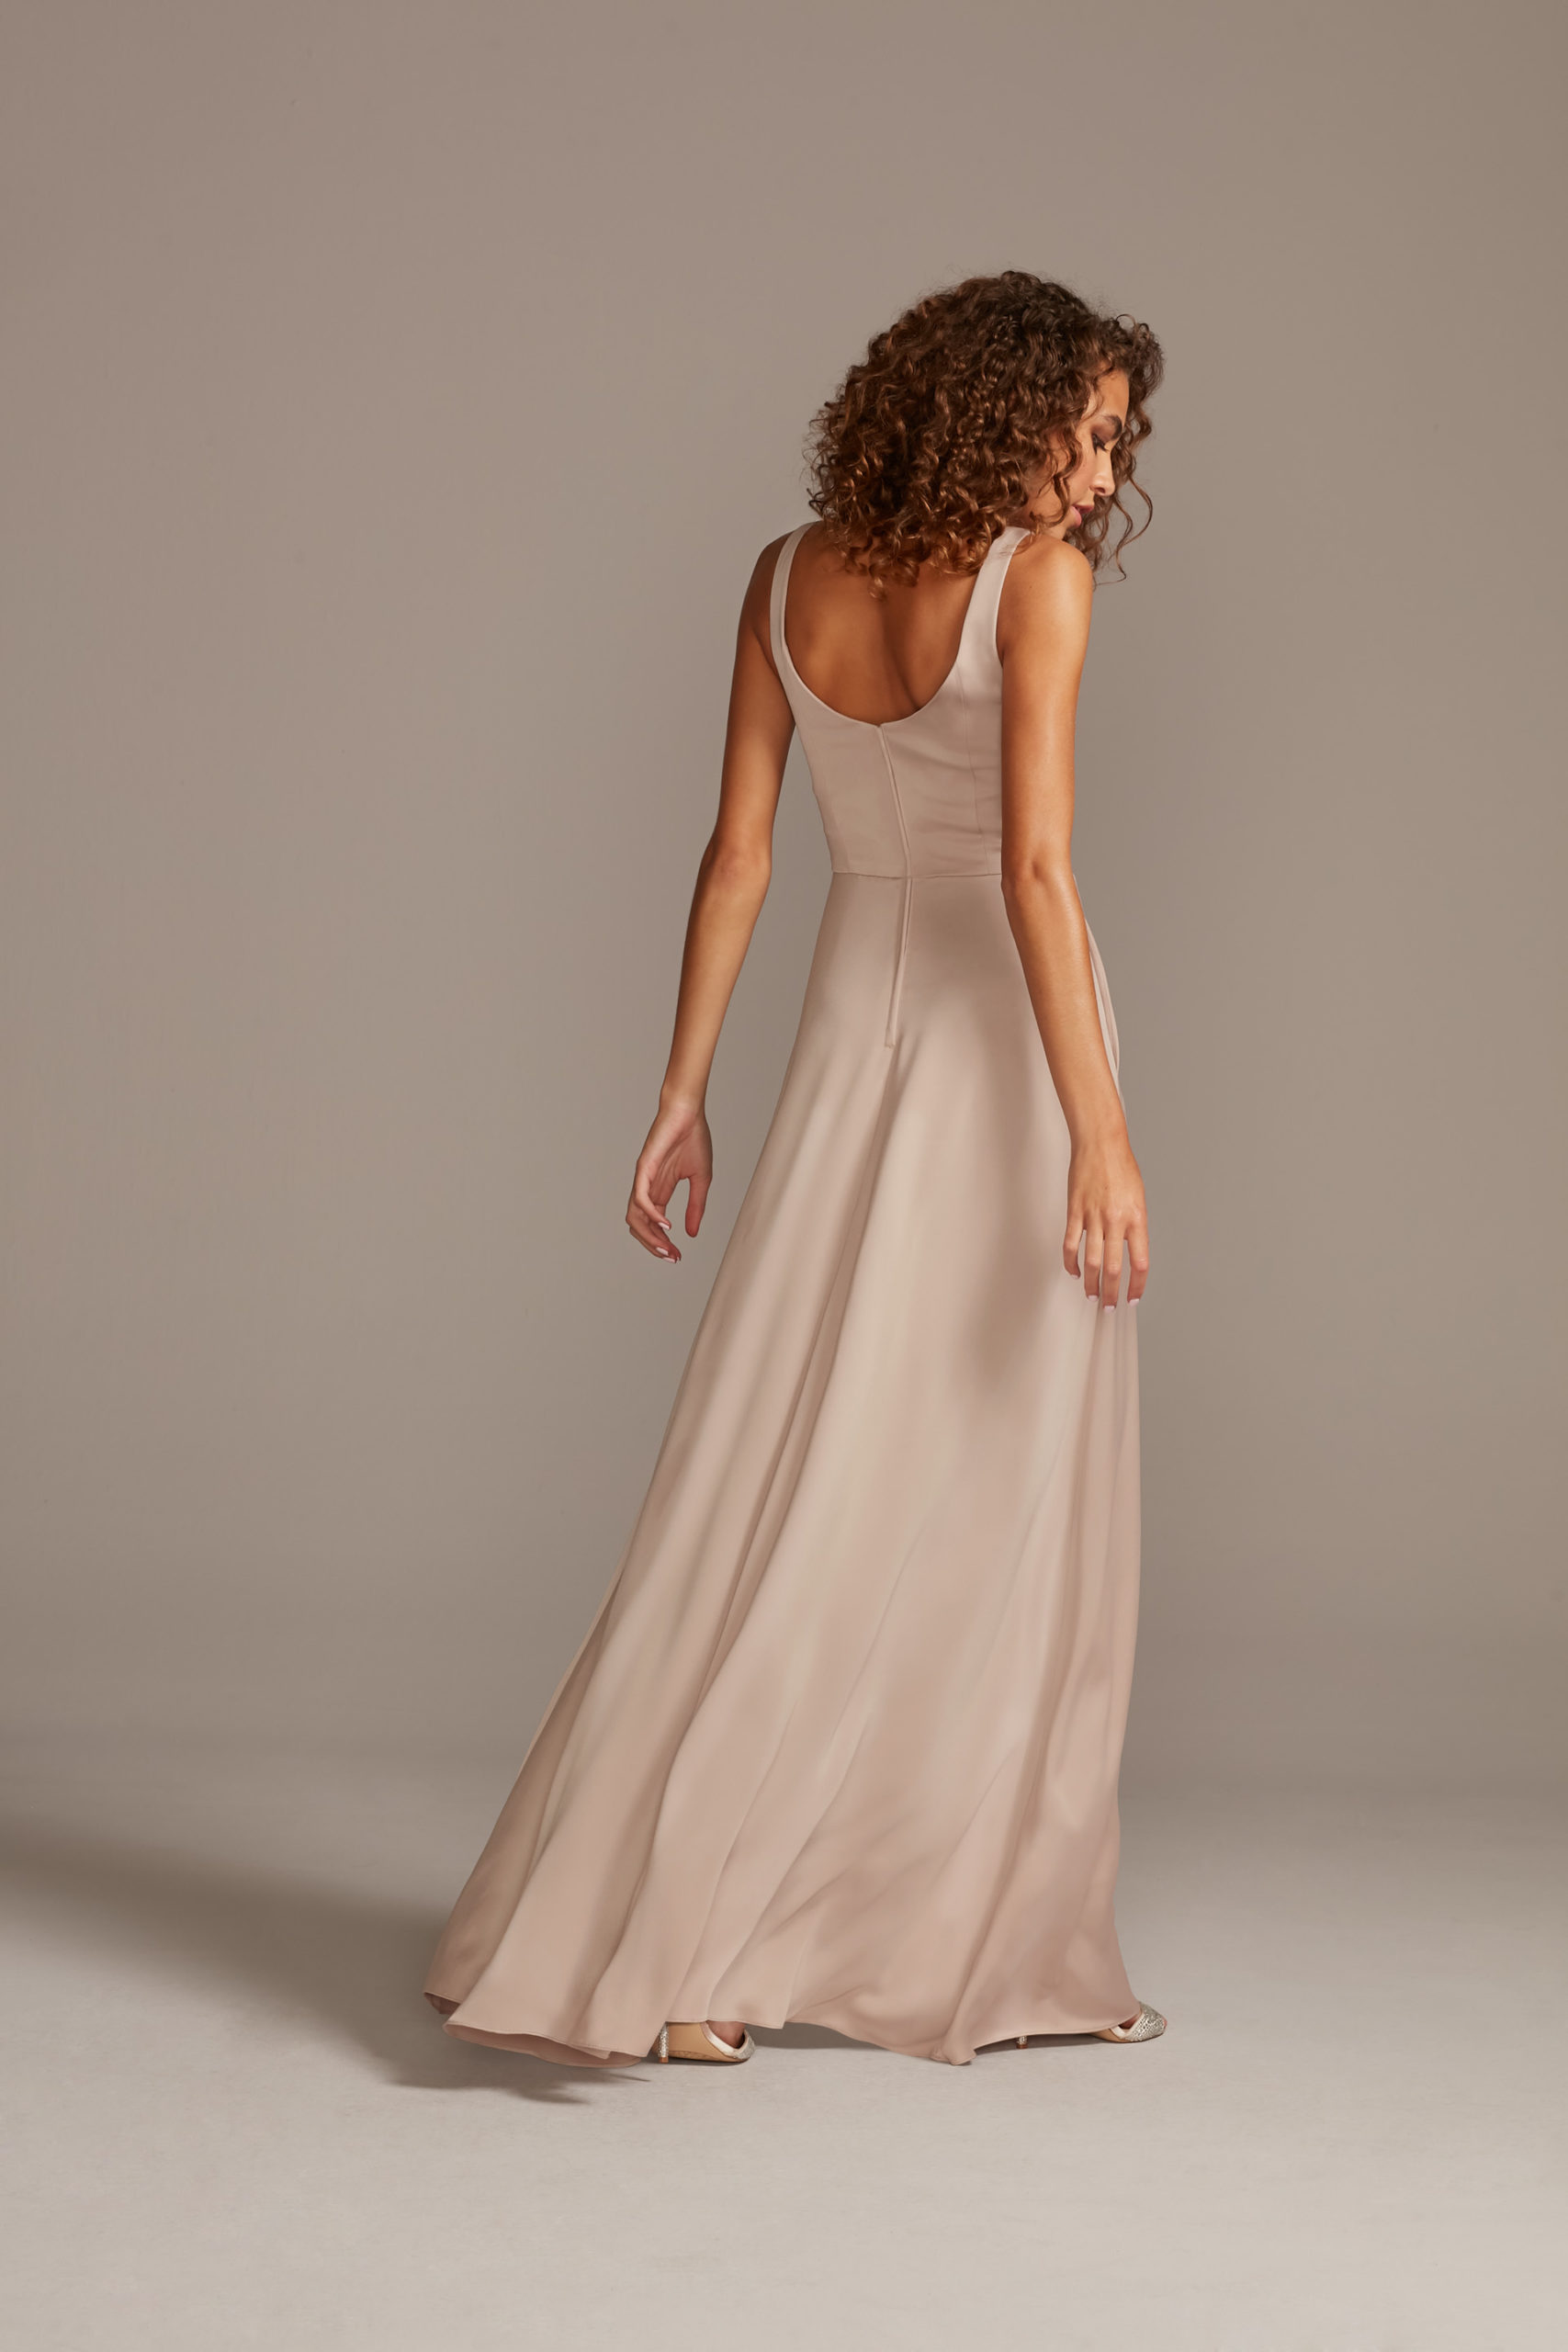 Scoop Neck Satin Bridesmaid Dress